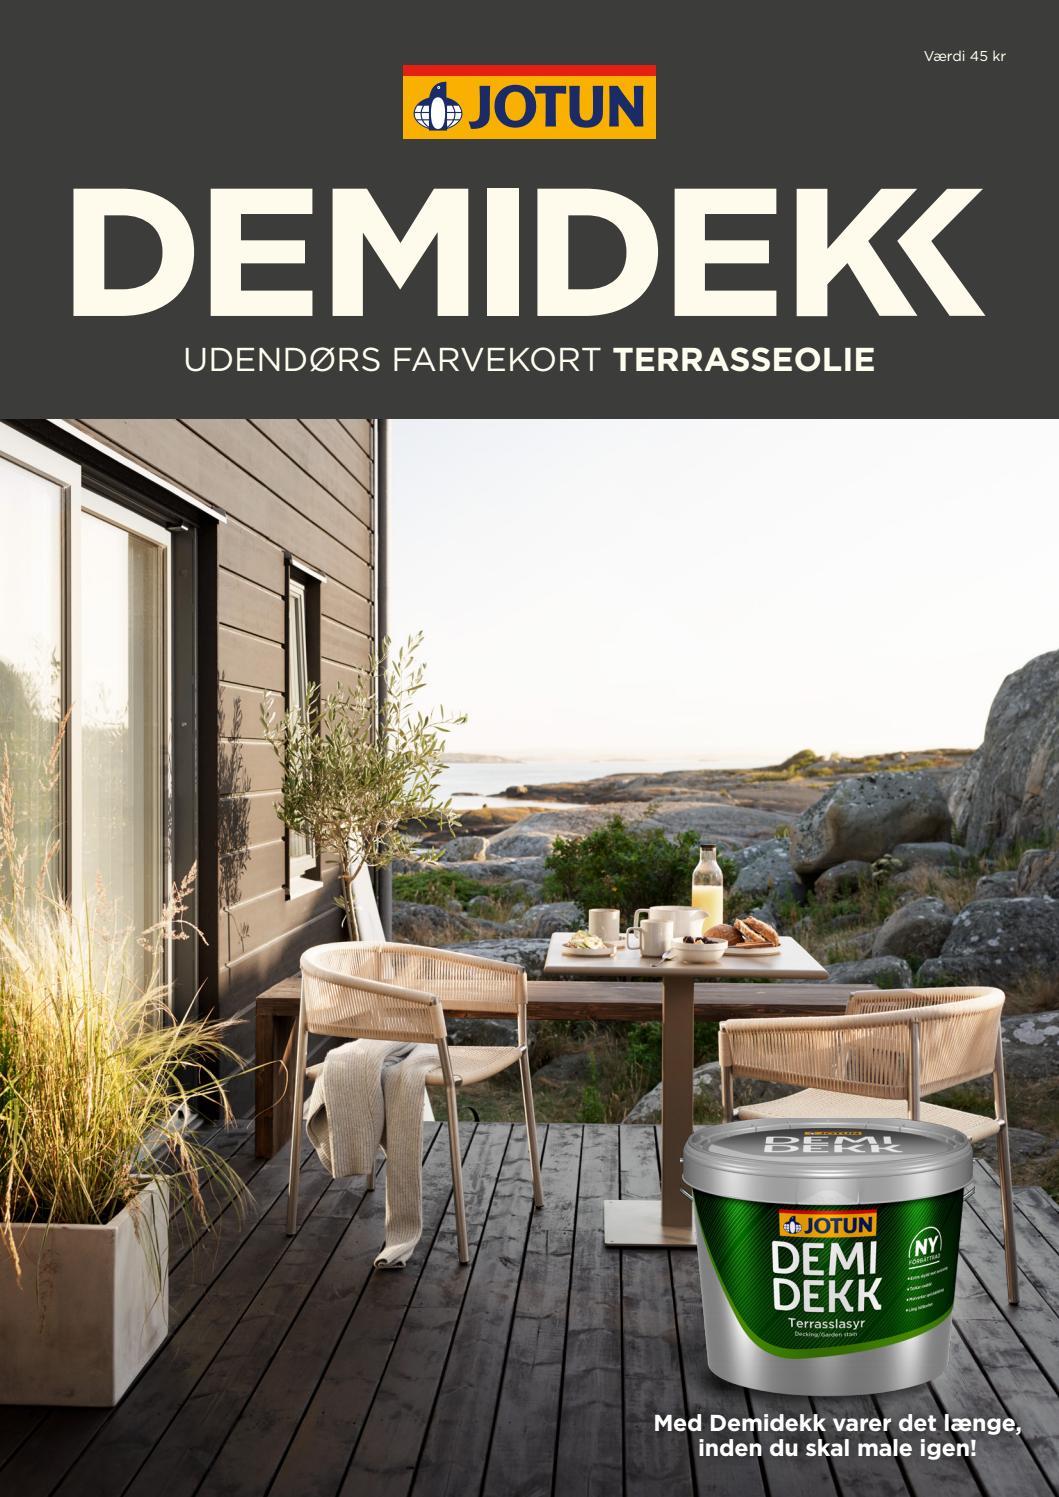 Picture of: Demidekk Udendors Farvekort Terrasseolie 2019 By Jotun Danmark Issuu